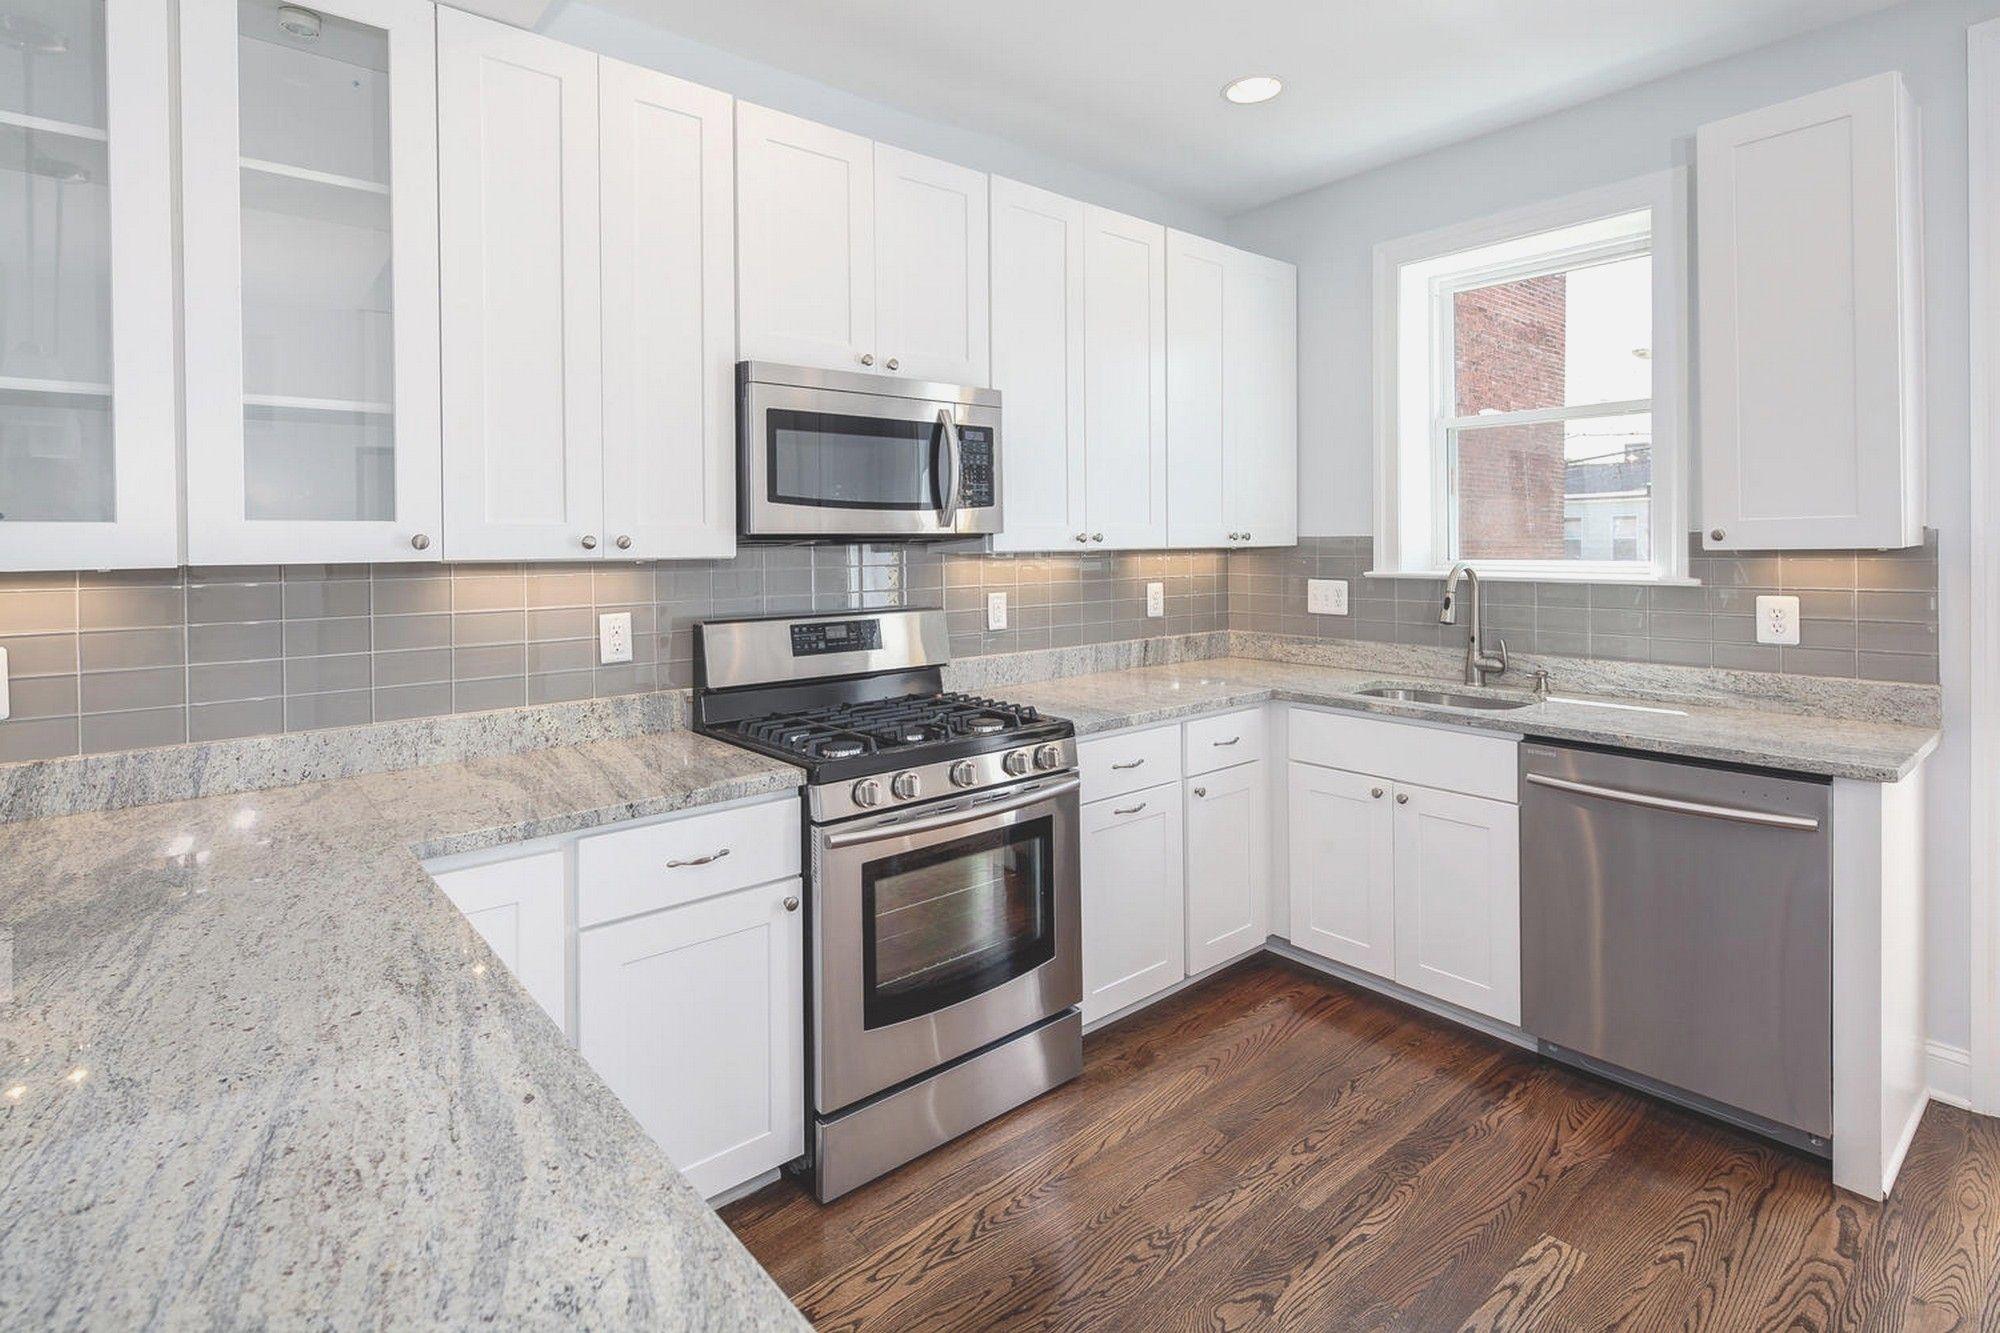 White Kitchens With Granite Countertops Backsplash Ideas For